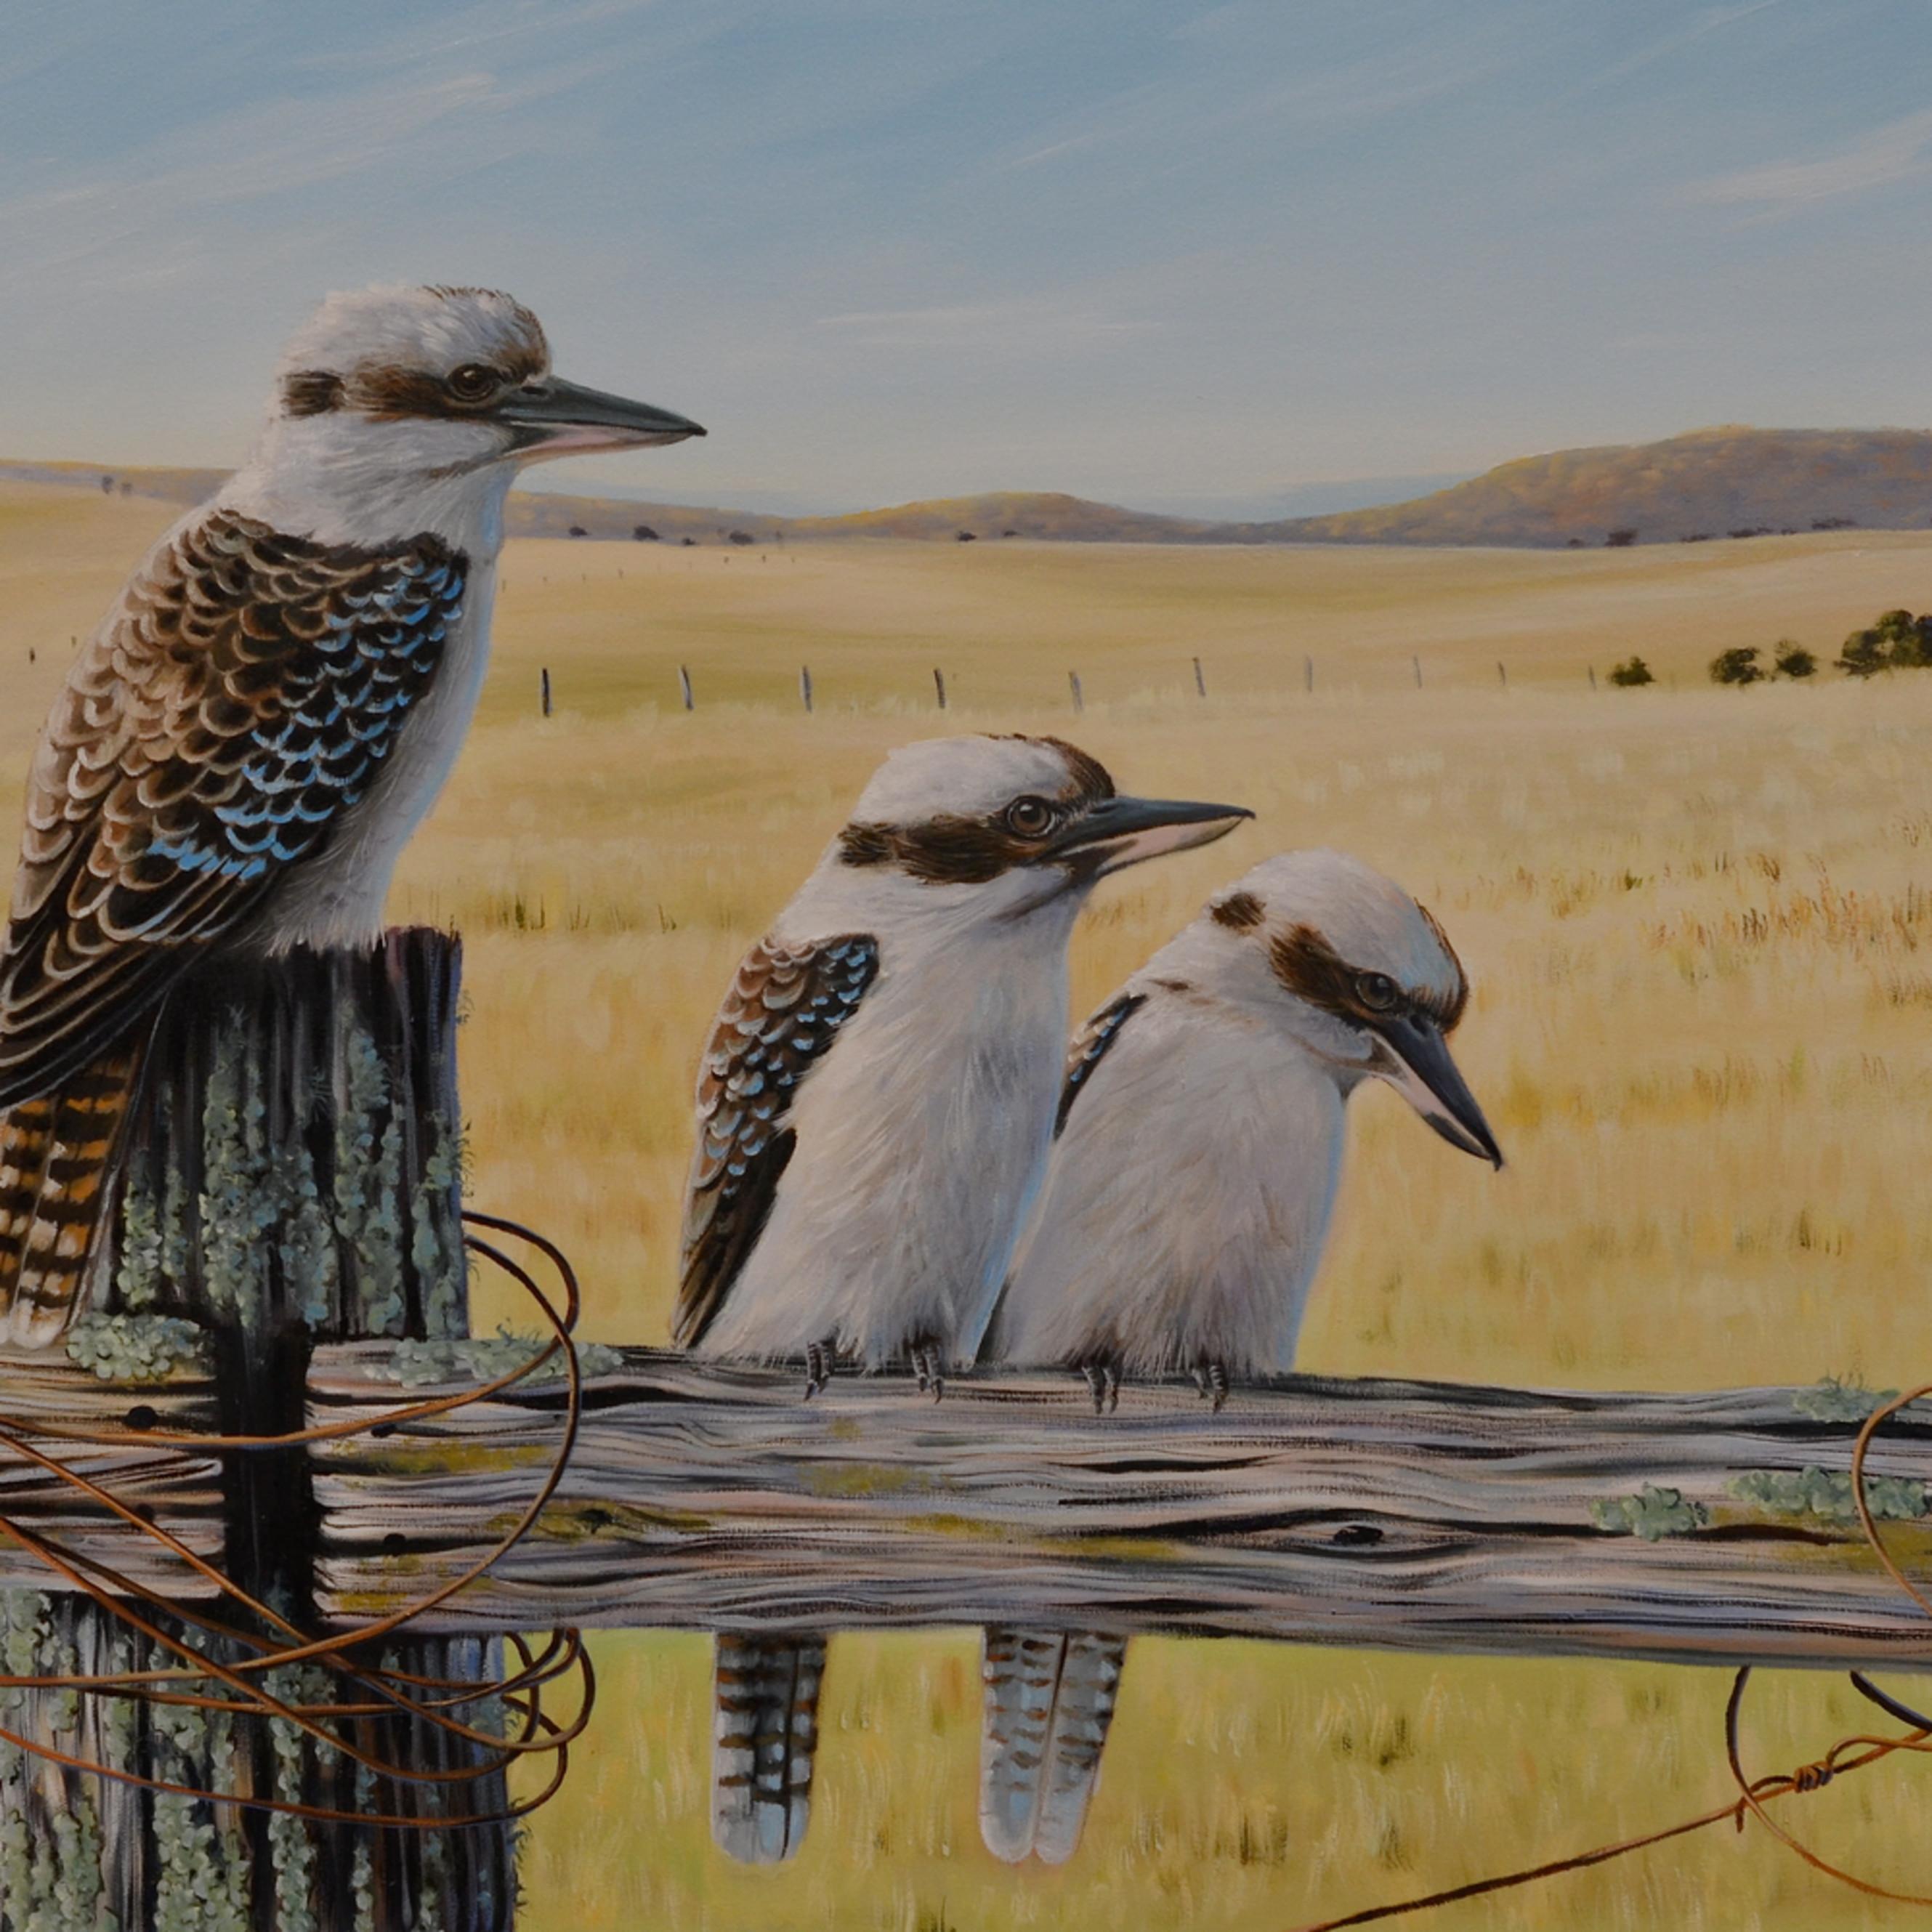 Grassland gathering   kookaburras bod4tx